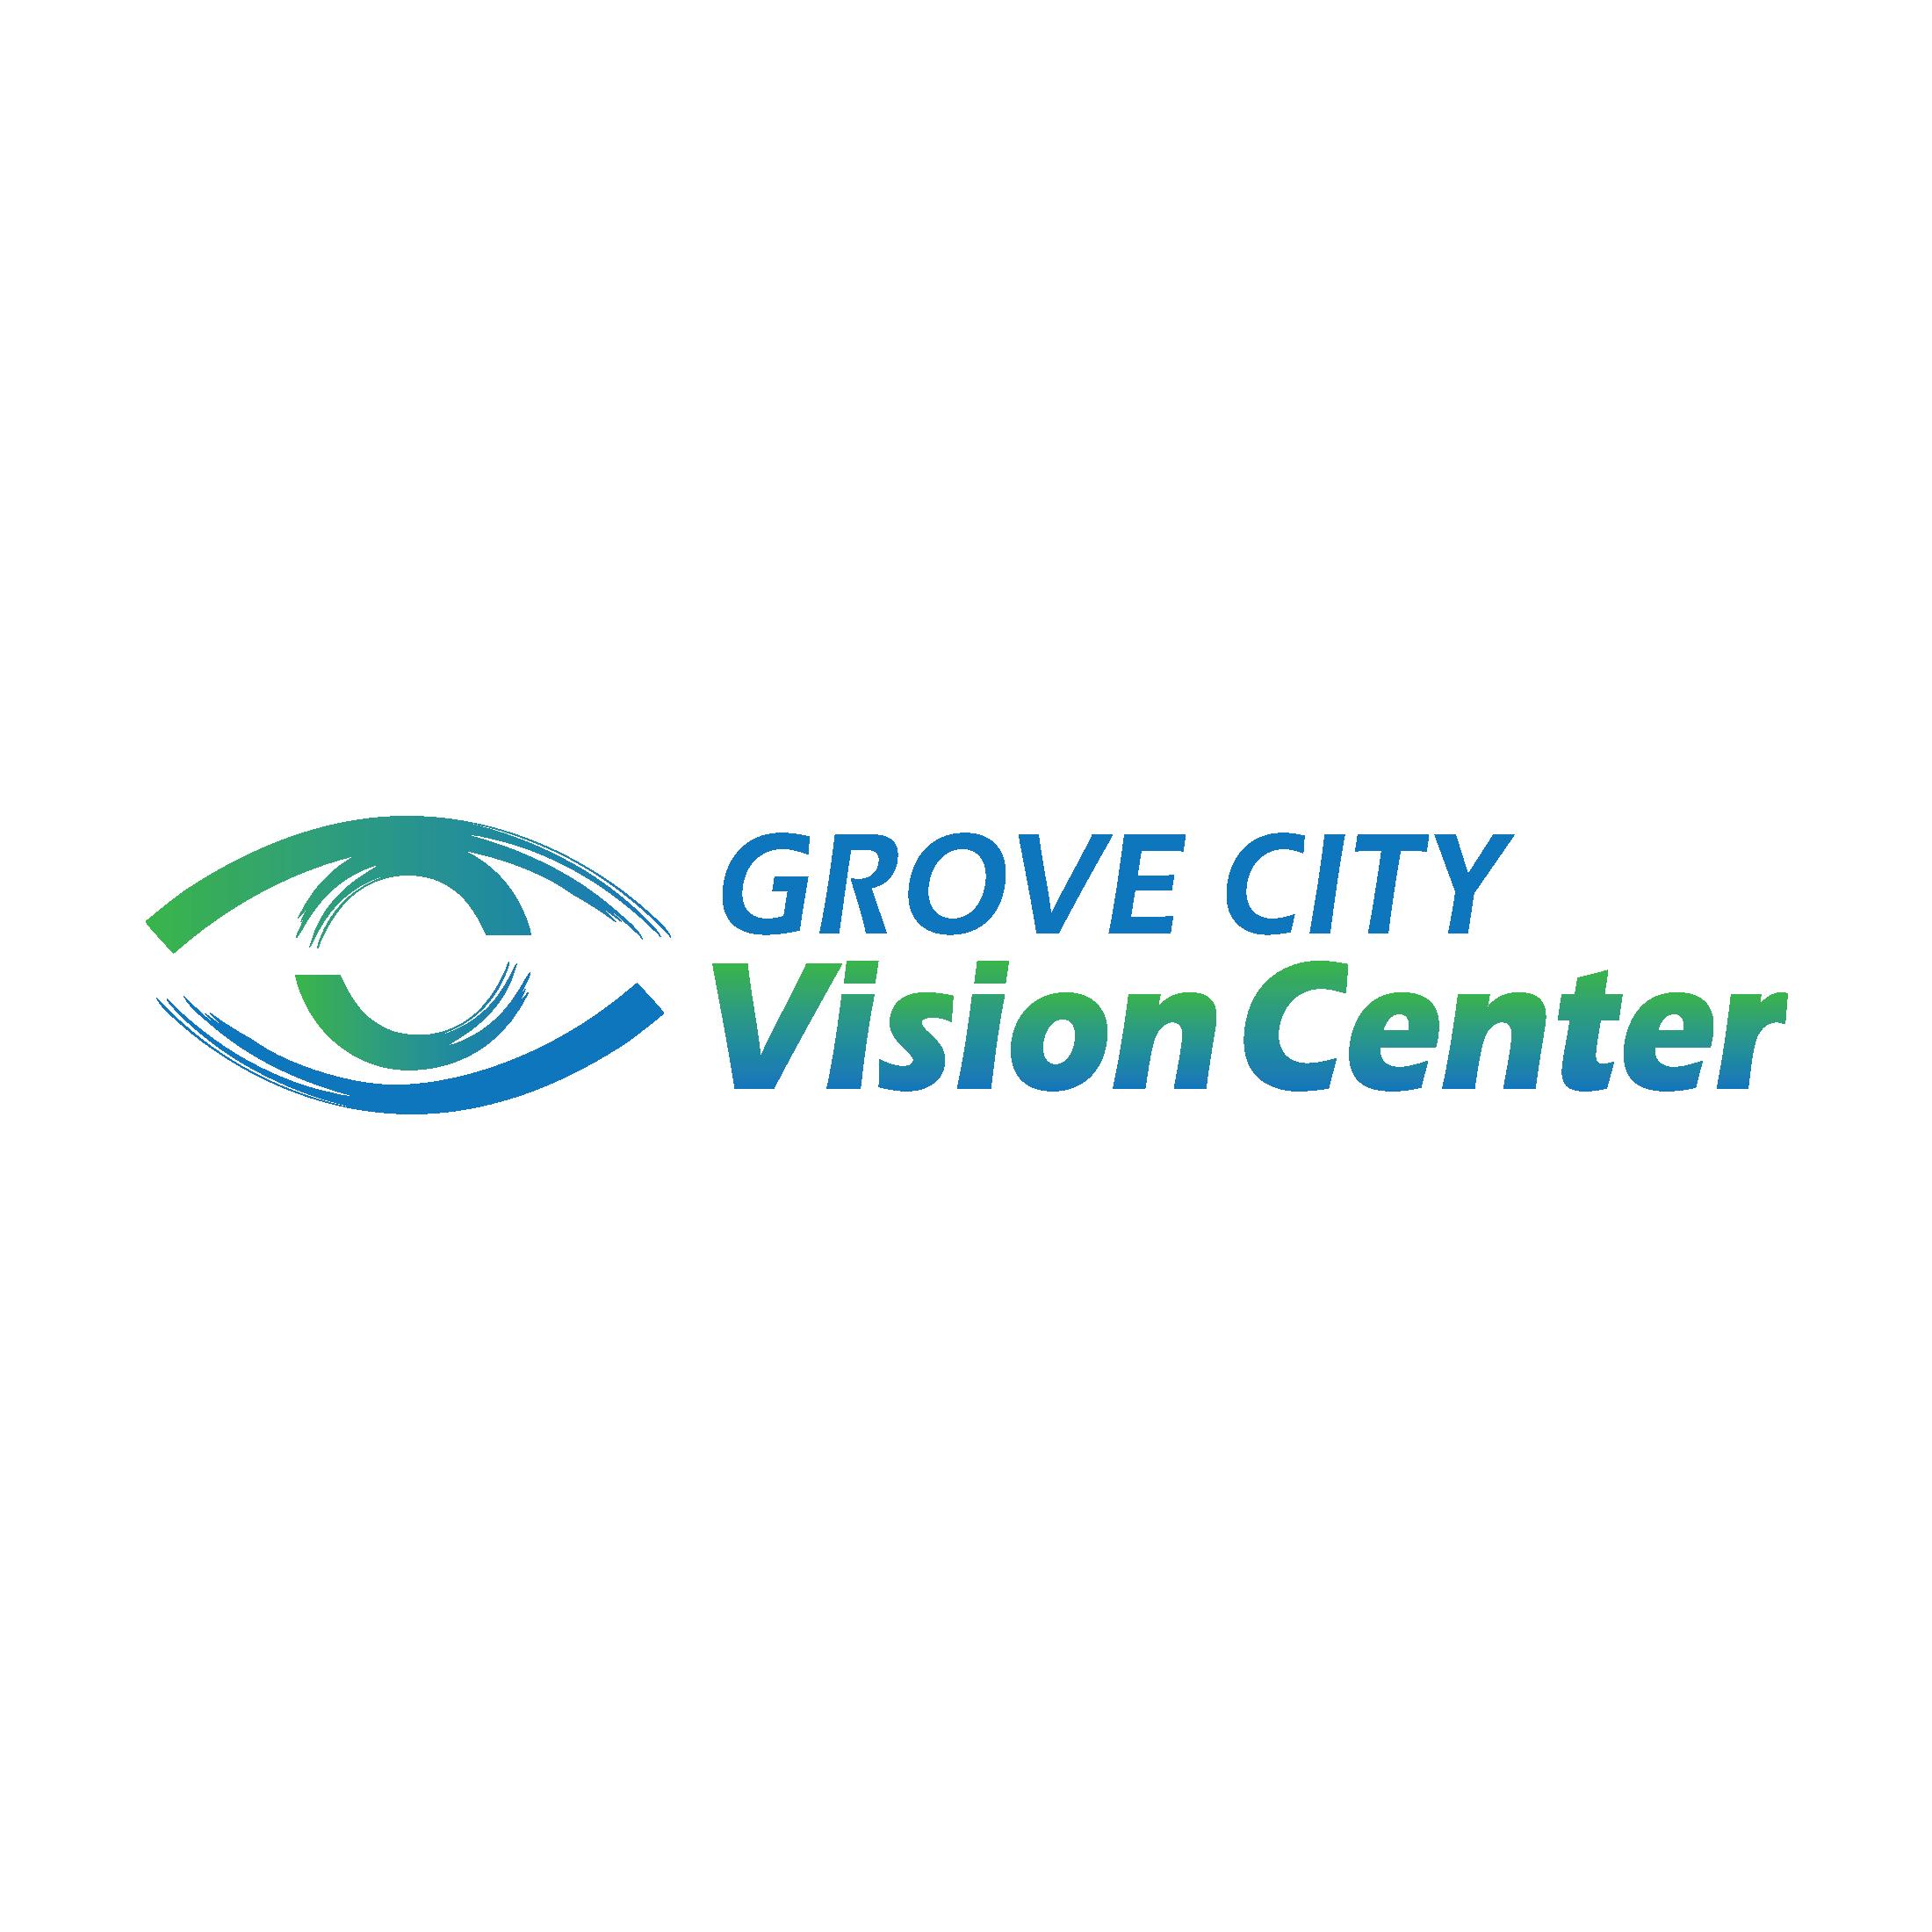 Grove City Vision Center - Grove City, OH - Optometrists